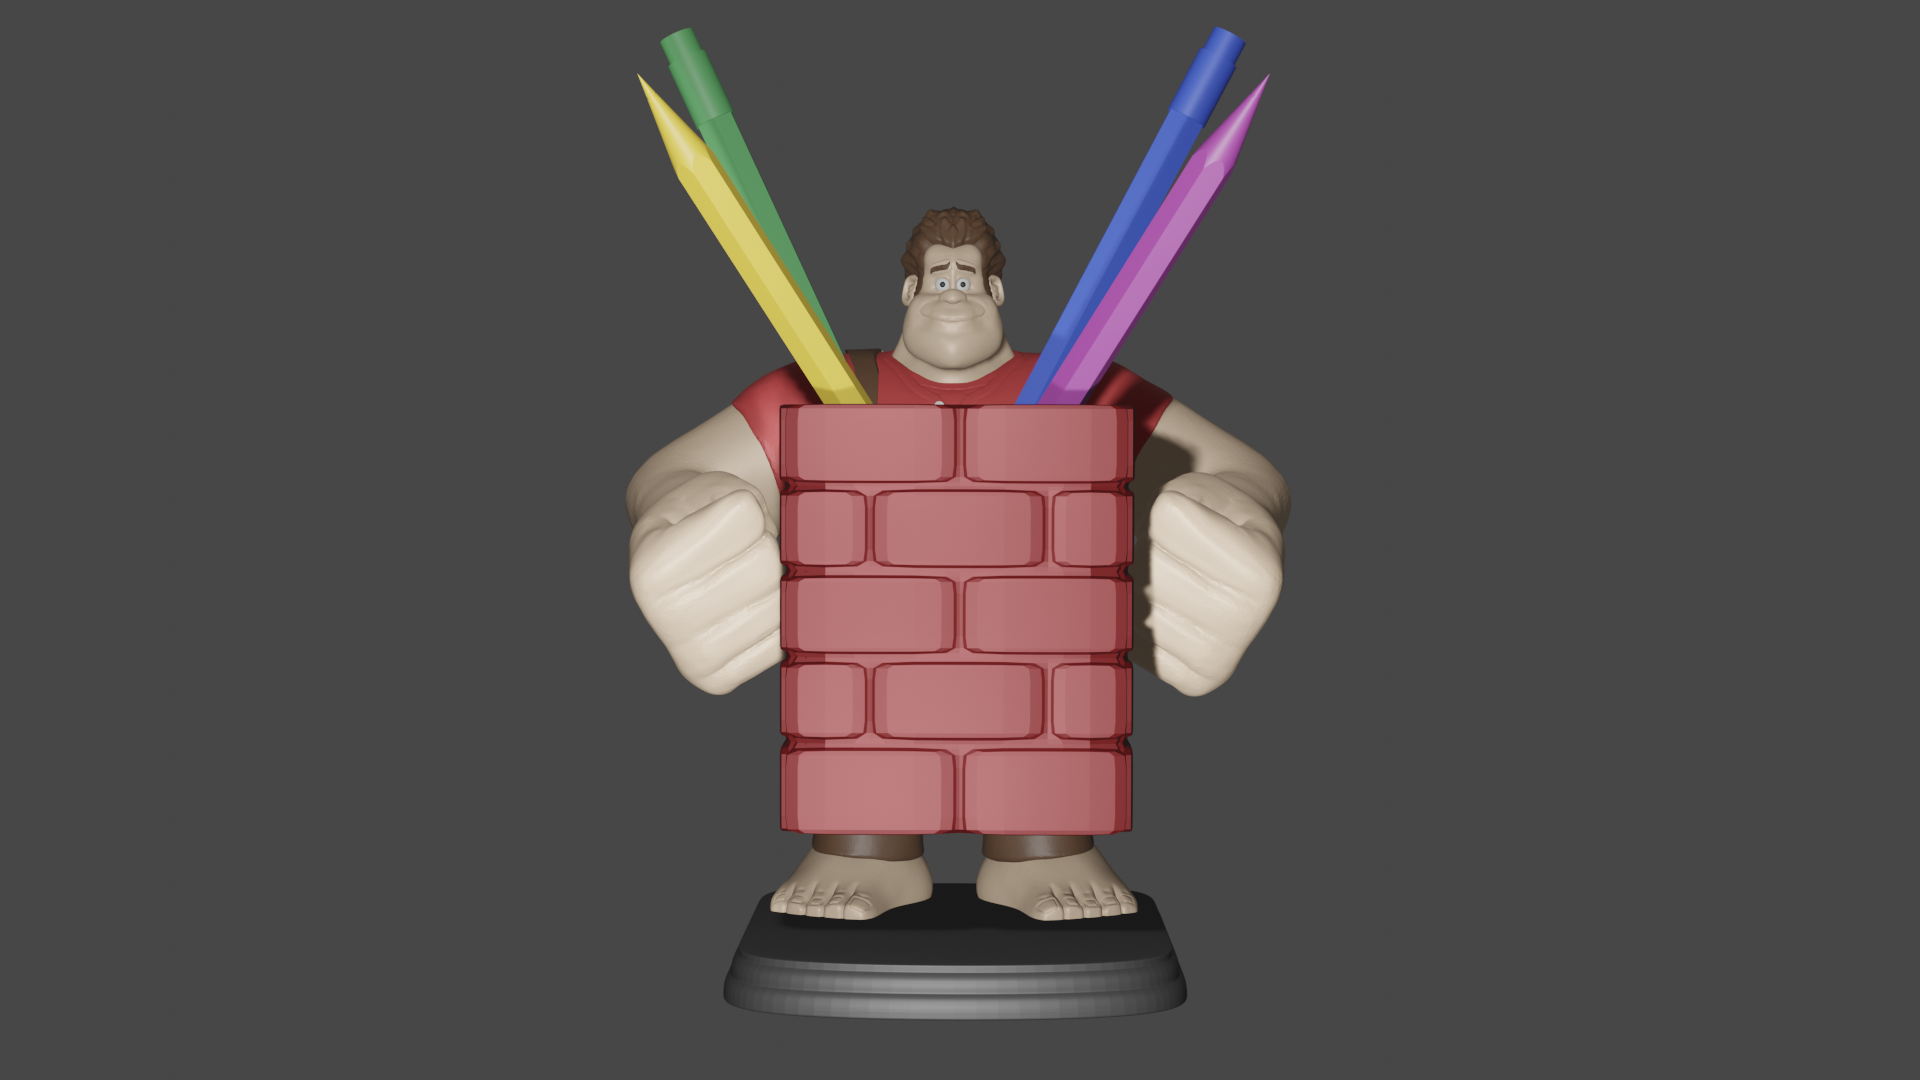 1 ralph.png Download free STL file Ralph the Feather Wrecker • 3D printer design, Aslan3d